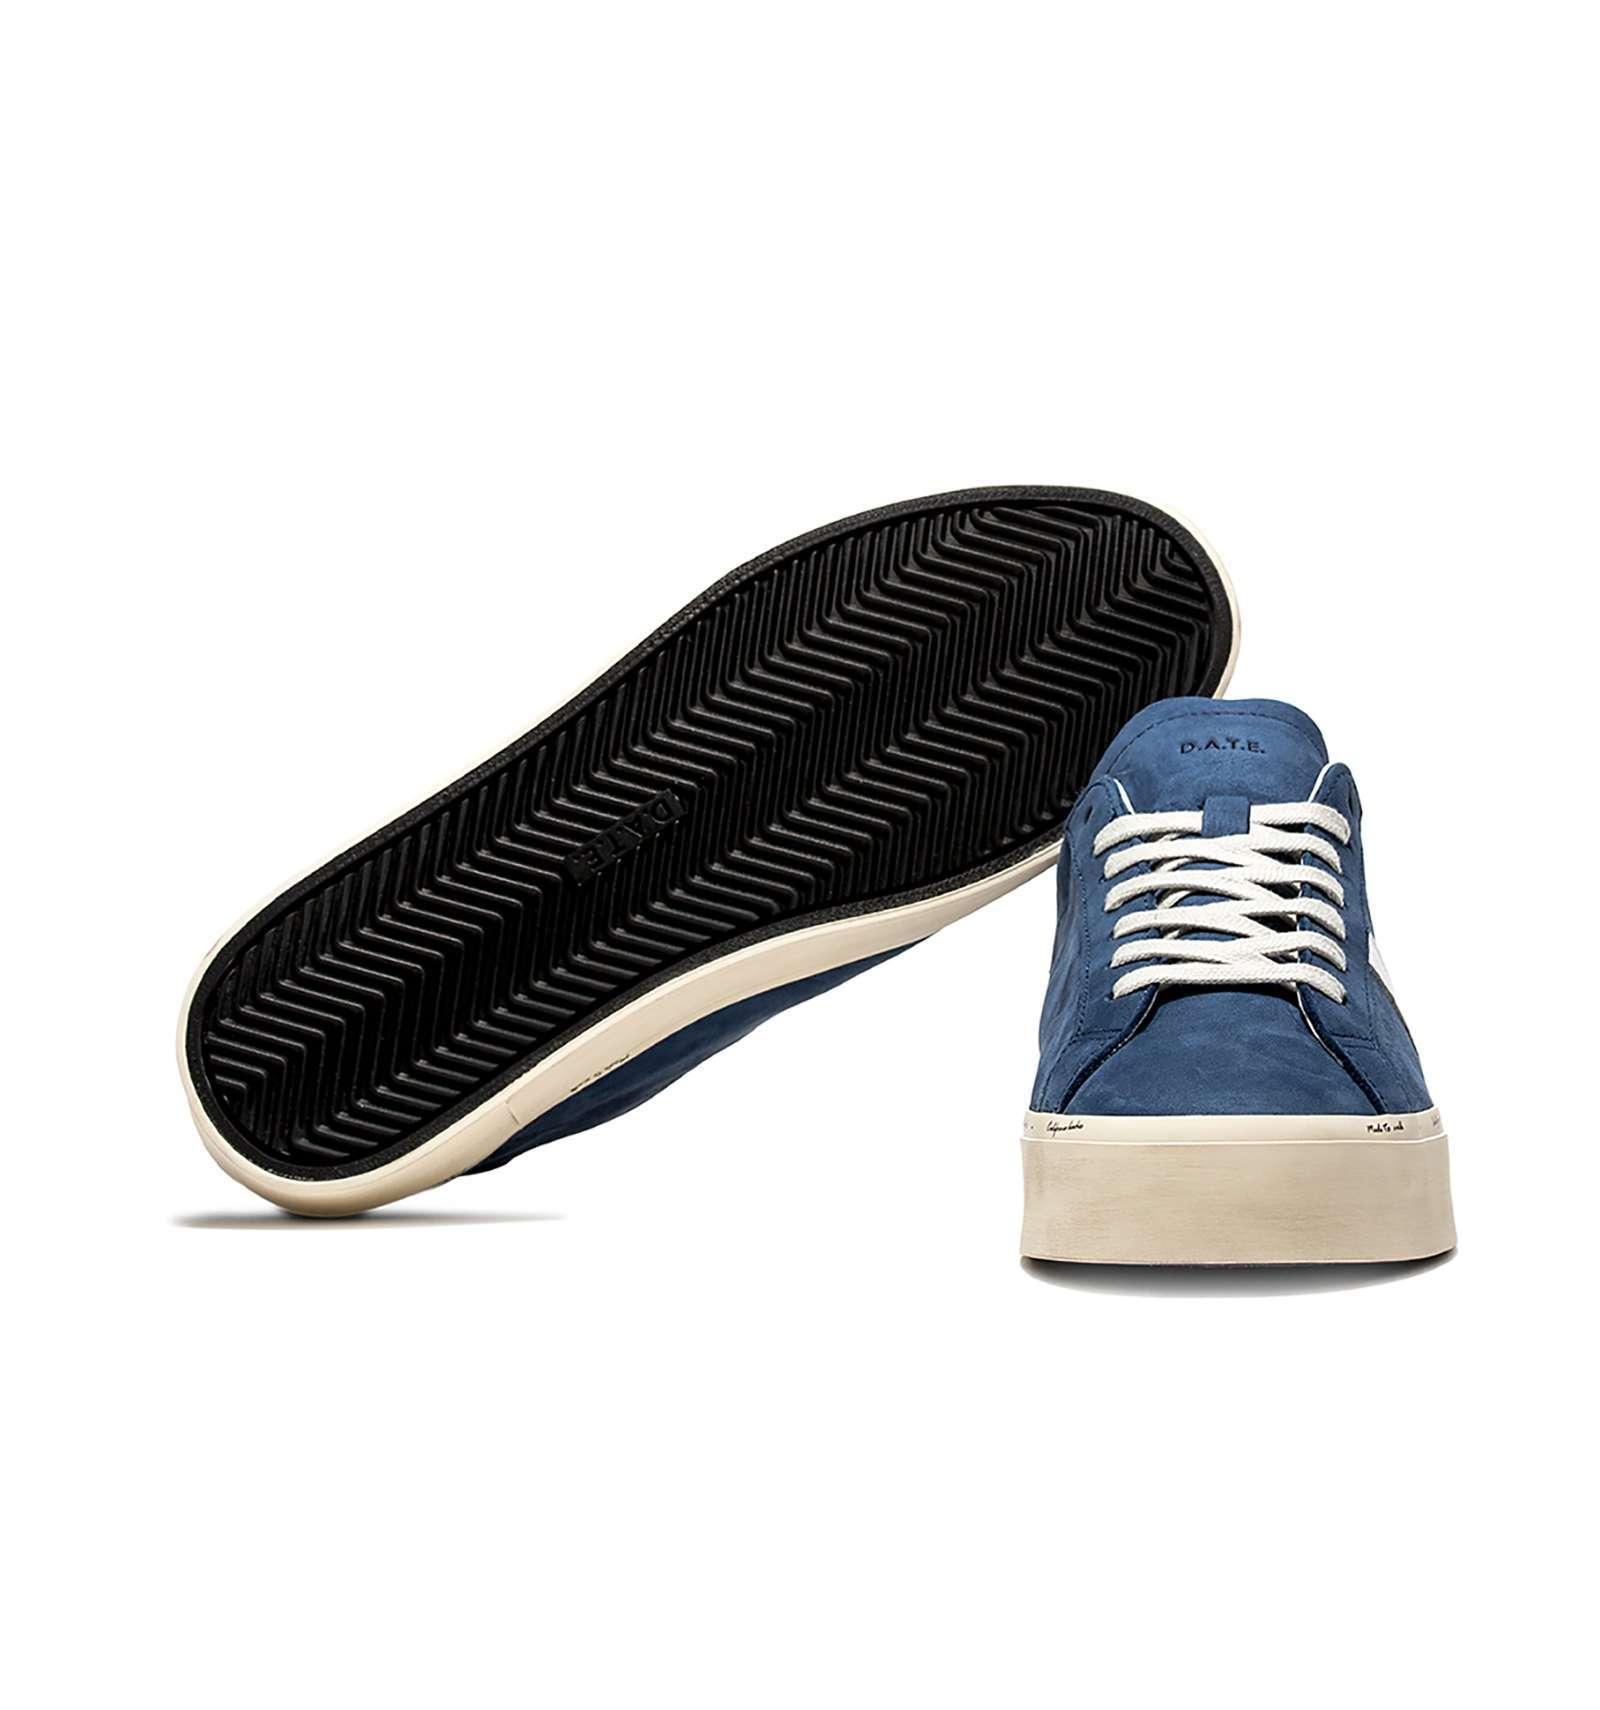 https://www.parmax.com/media/catalog/product/a/i/AI-outlet_parmax-sneaker-uomo-Date-M301-D.jpg